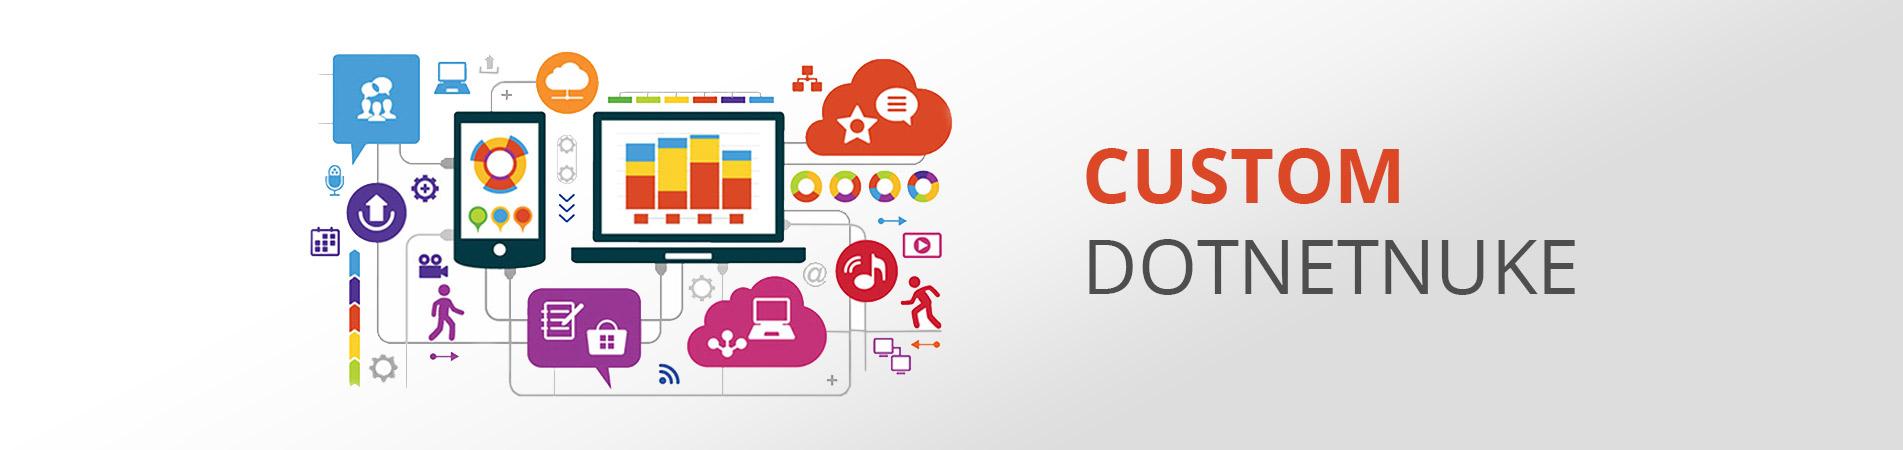 Custom DNN Website Development Bangalore India, DotNetNuke Module ...